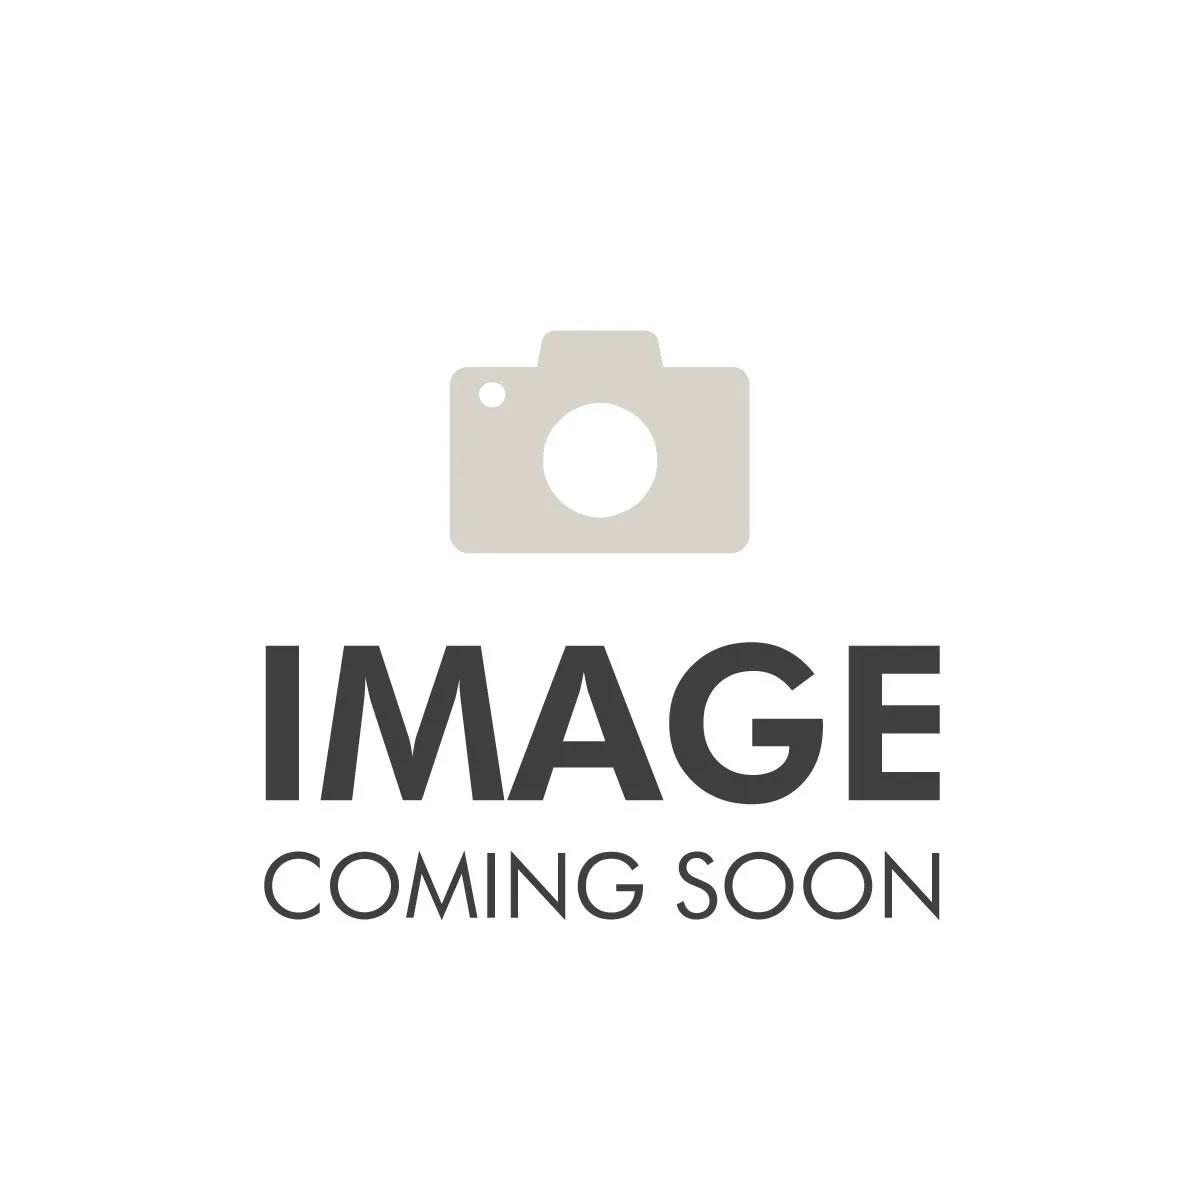 Soft Top, Black Denim, Clear Windows; 86-95 Suzuki Samurai